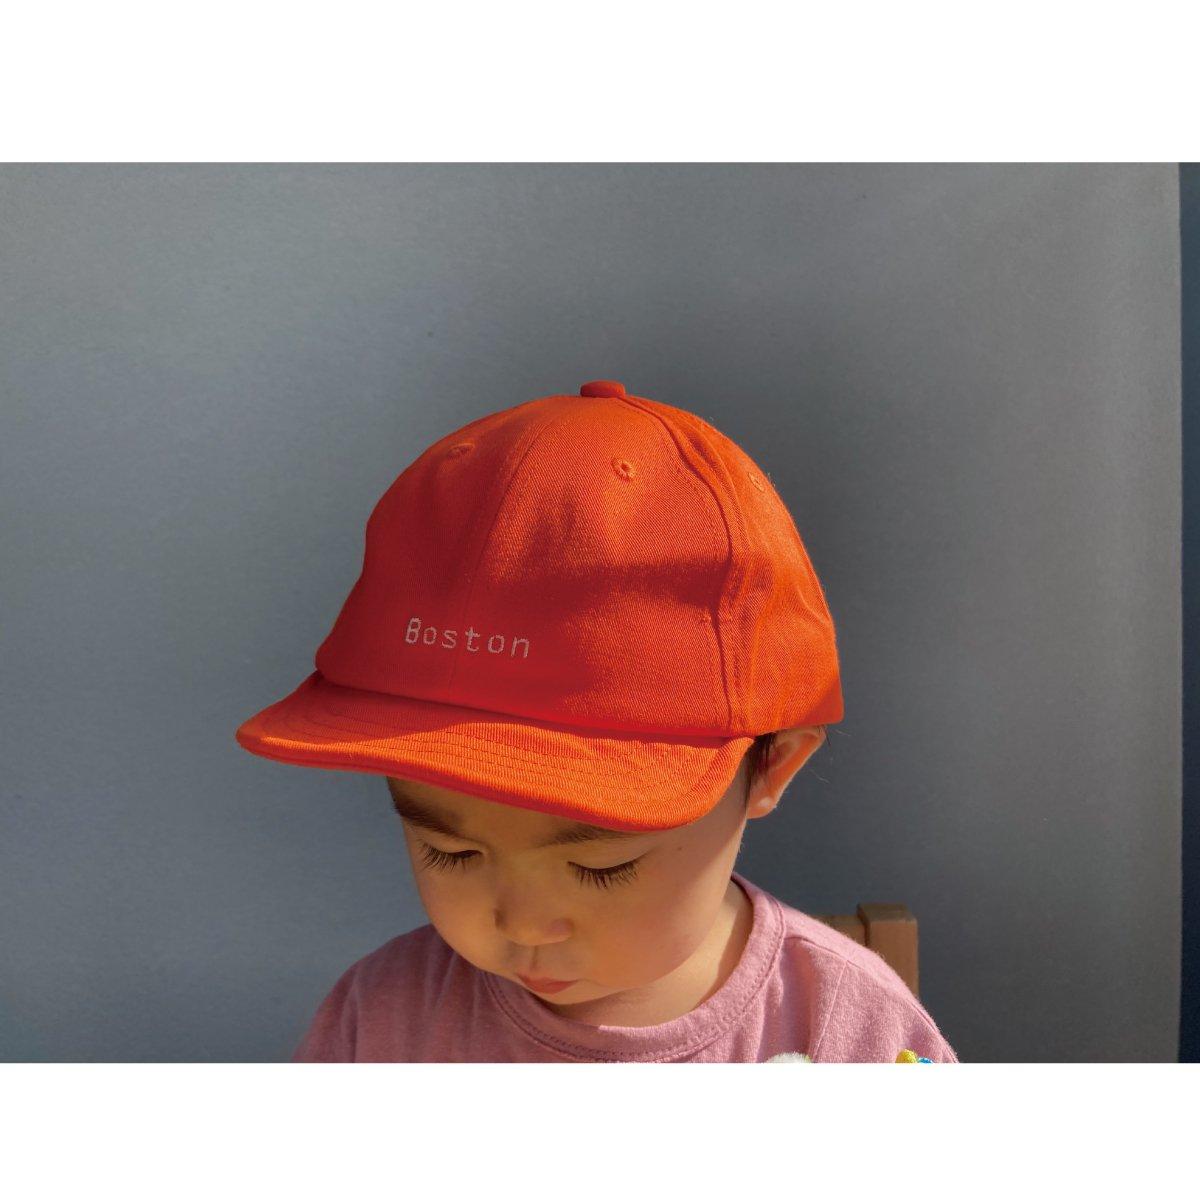 【KIDS】USA Twill Cap 詳細画像37